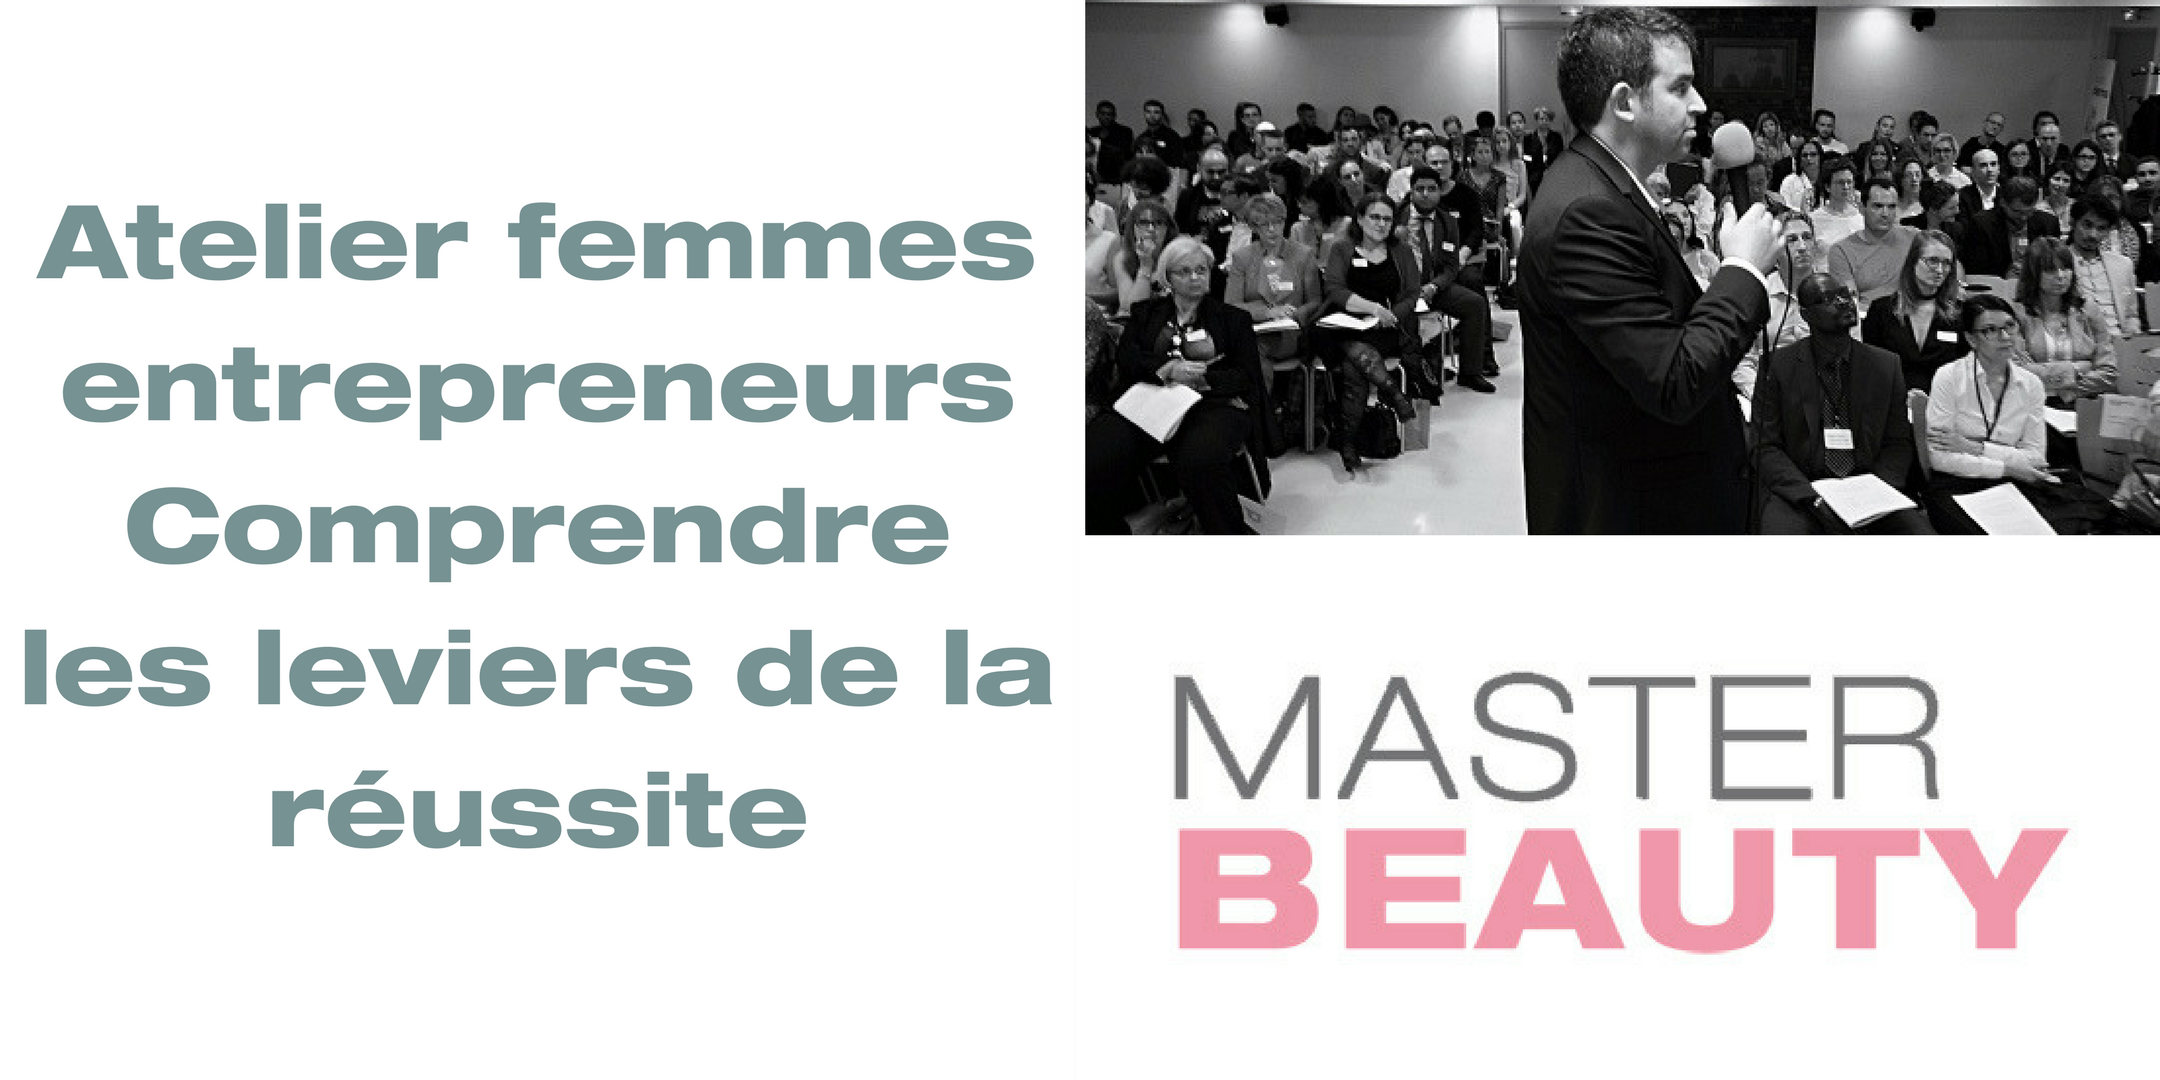 Atelier femmes entrepreneurs : Comprendre les